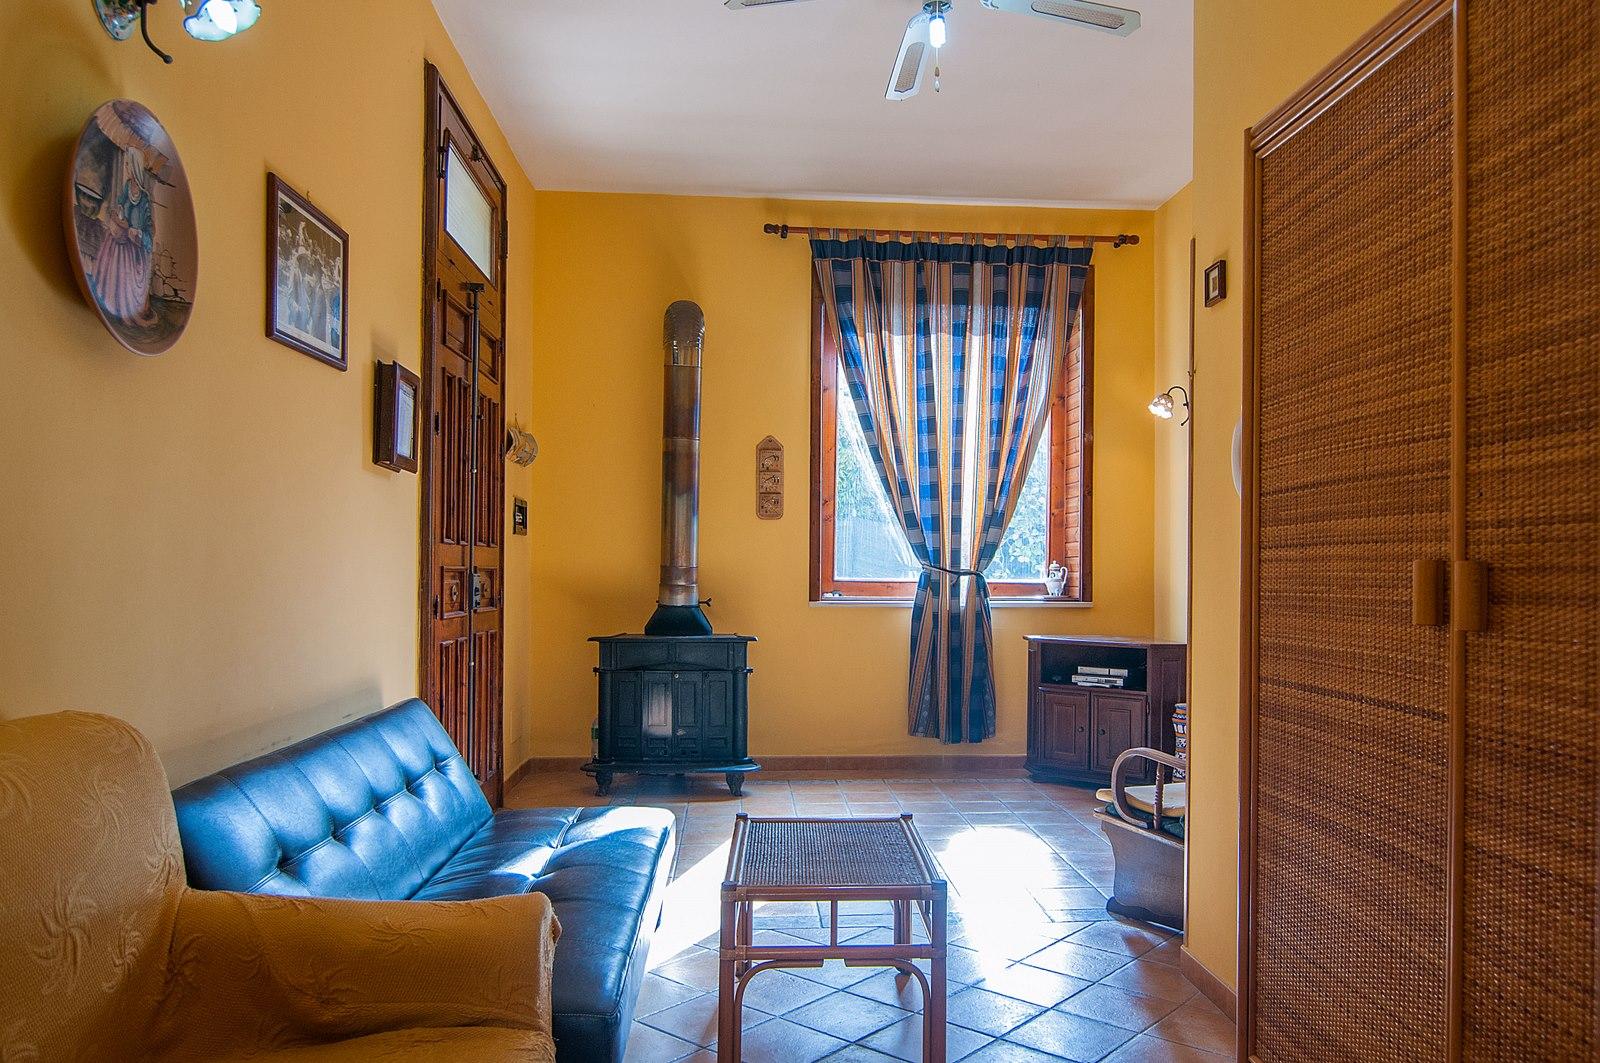 Maison de vacances Villetta a Lido (1540086), Lido di Noto, Siracusa, Sicile, Italie, image 19